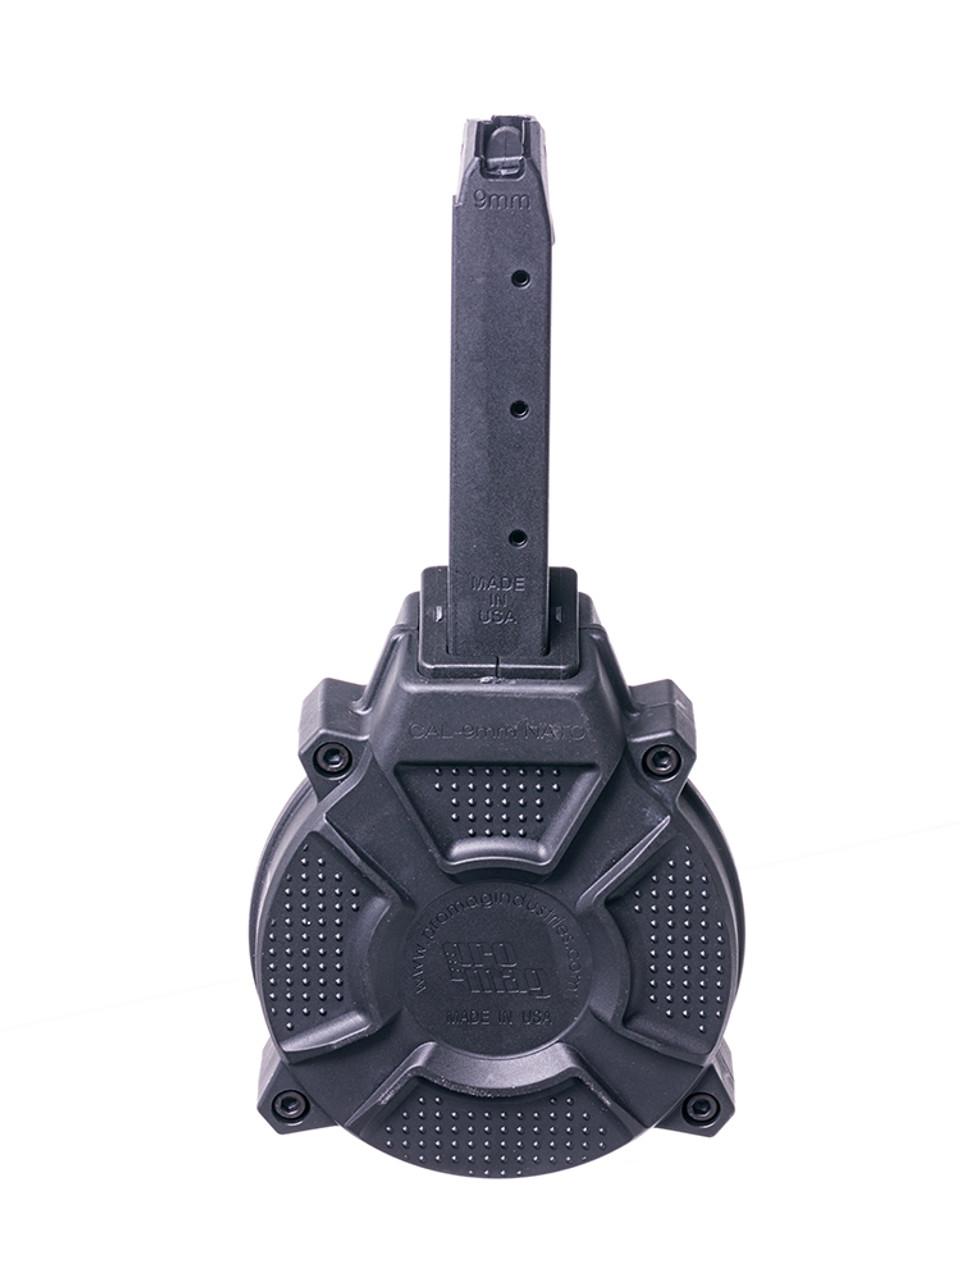 Fits the Glock® Model 17 & 19 9mm (50) Rd - Black Polymer Drum